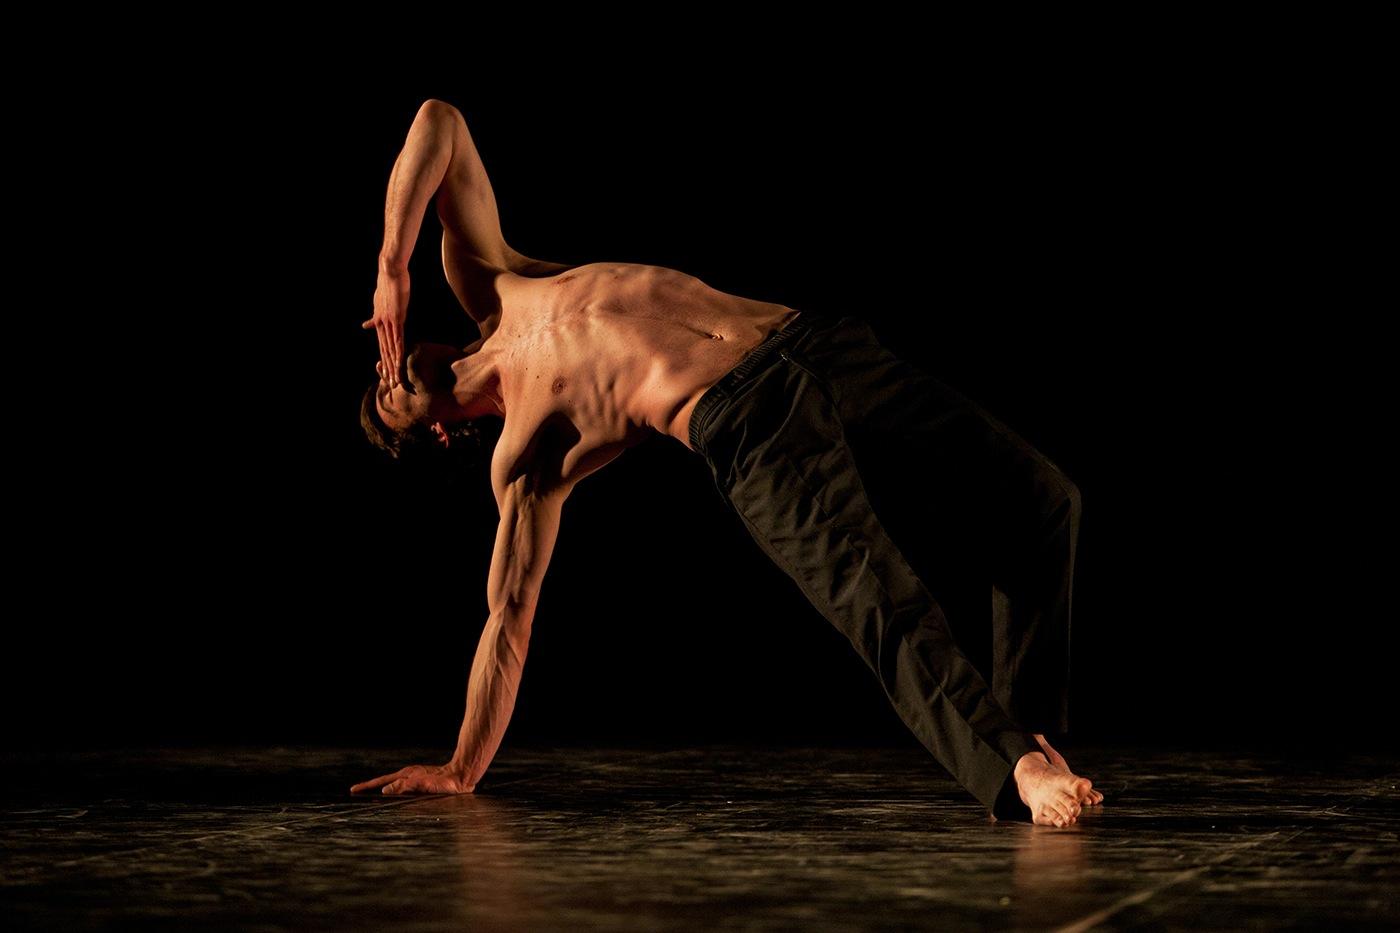 photographe-reportage-danse-avec-ton-crous-guillaume-heraud-016-small